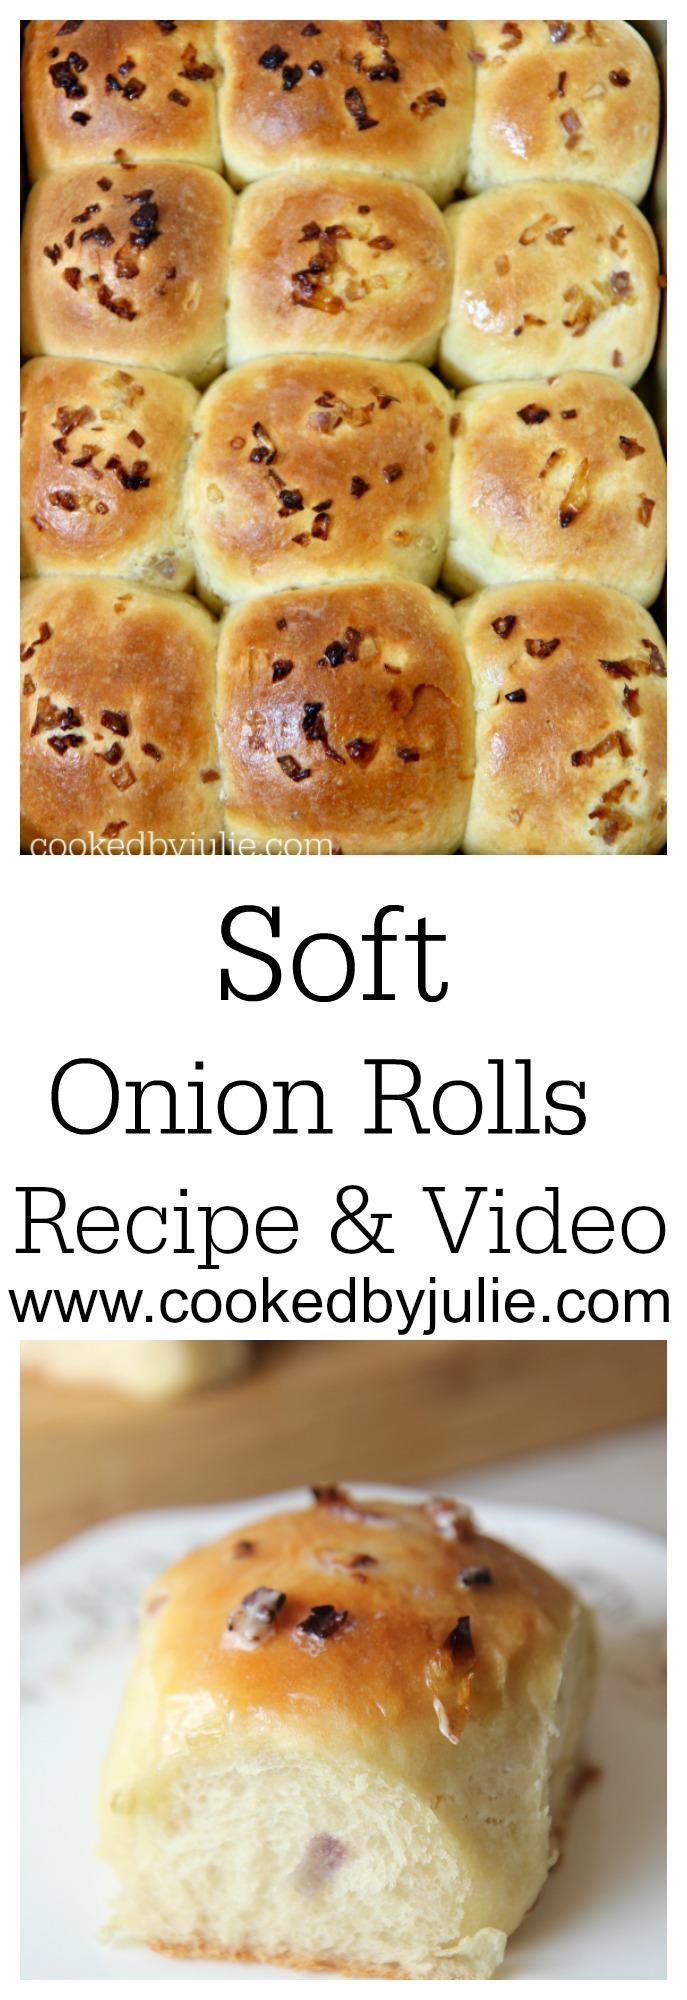 Soft Onion Rolls - Recipe & Video